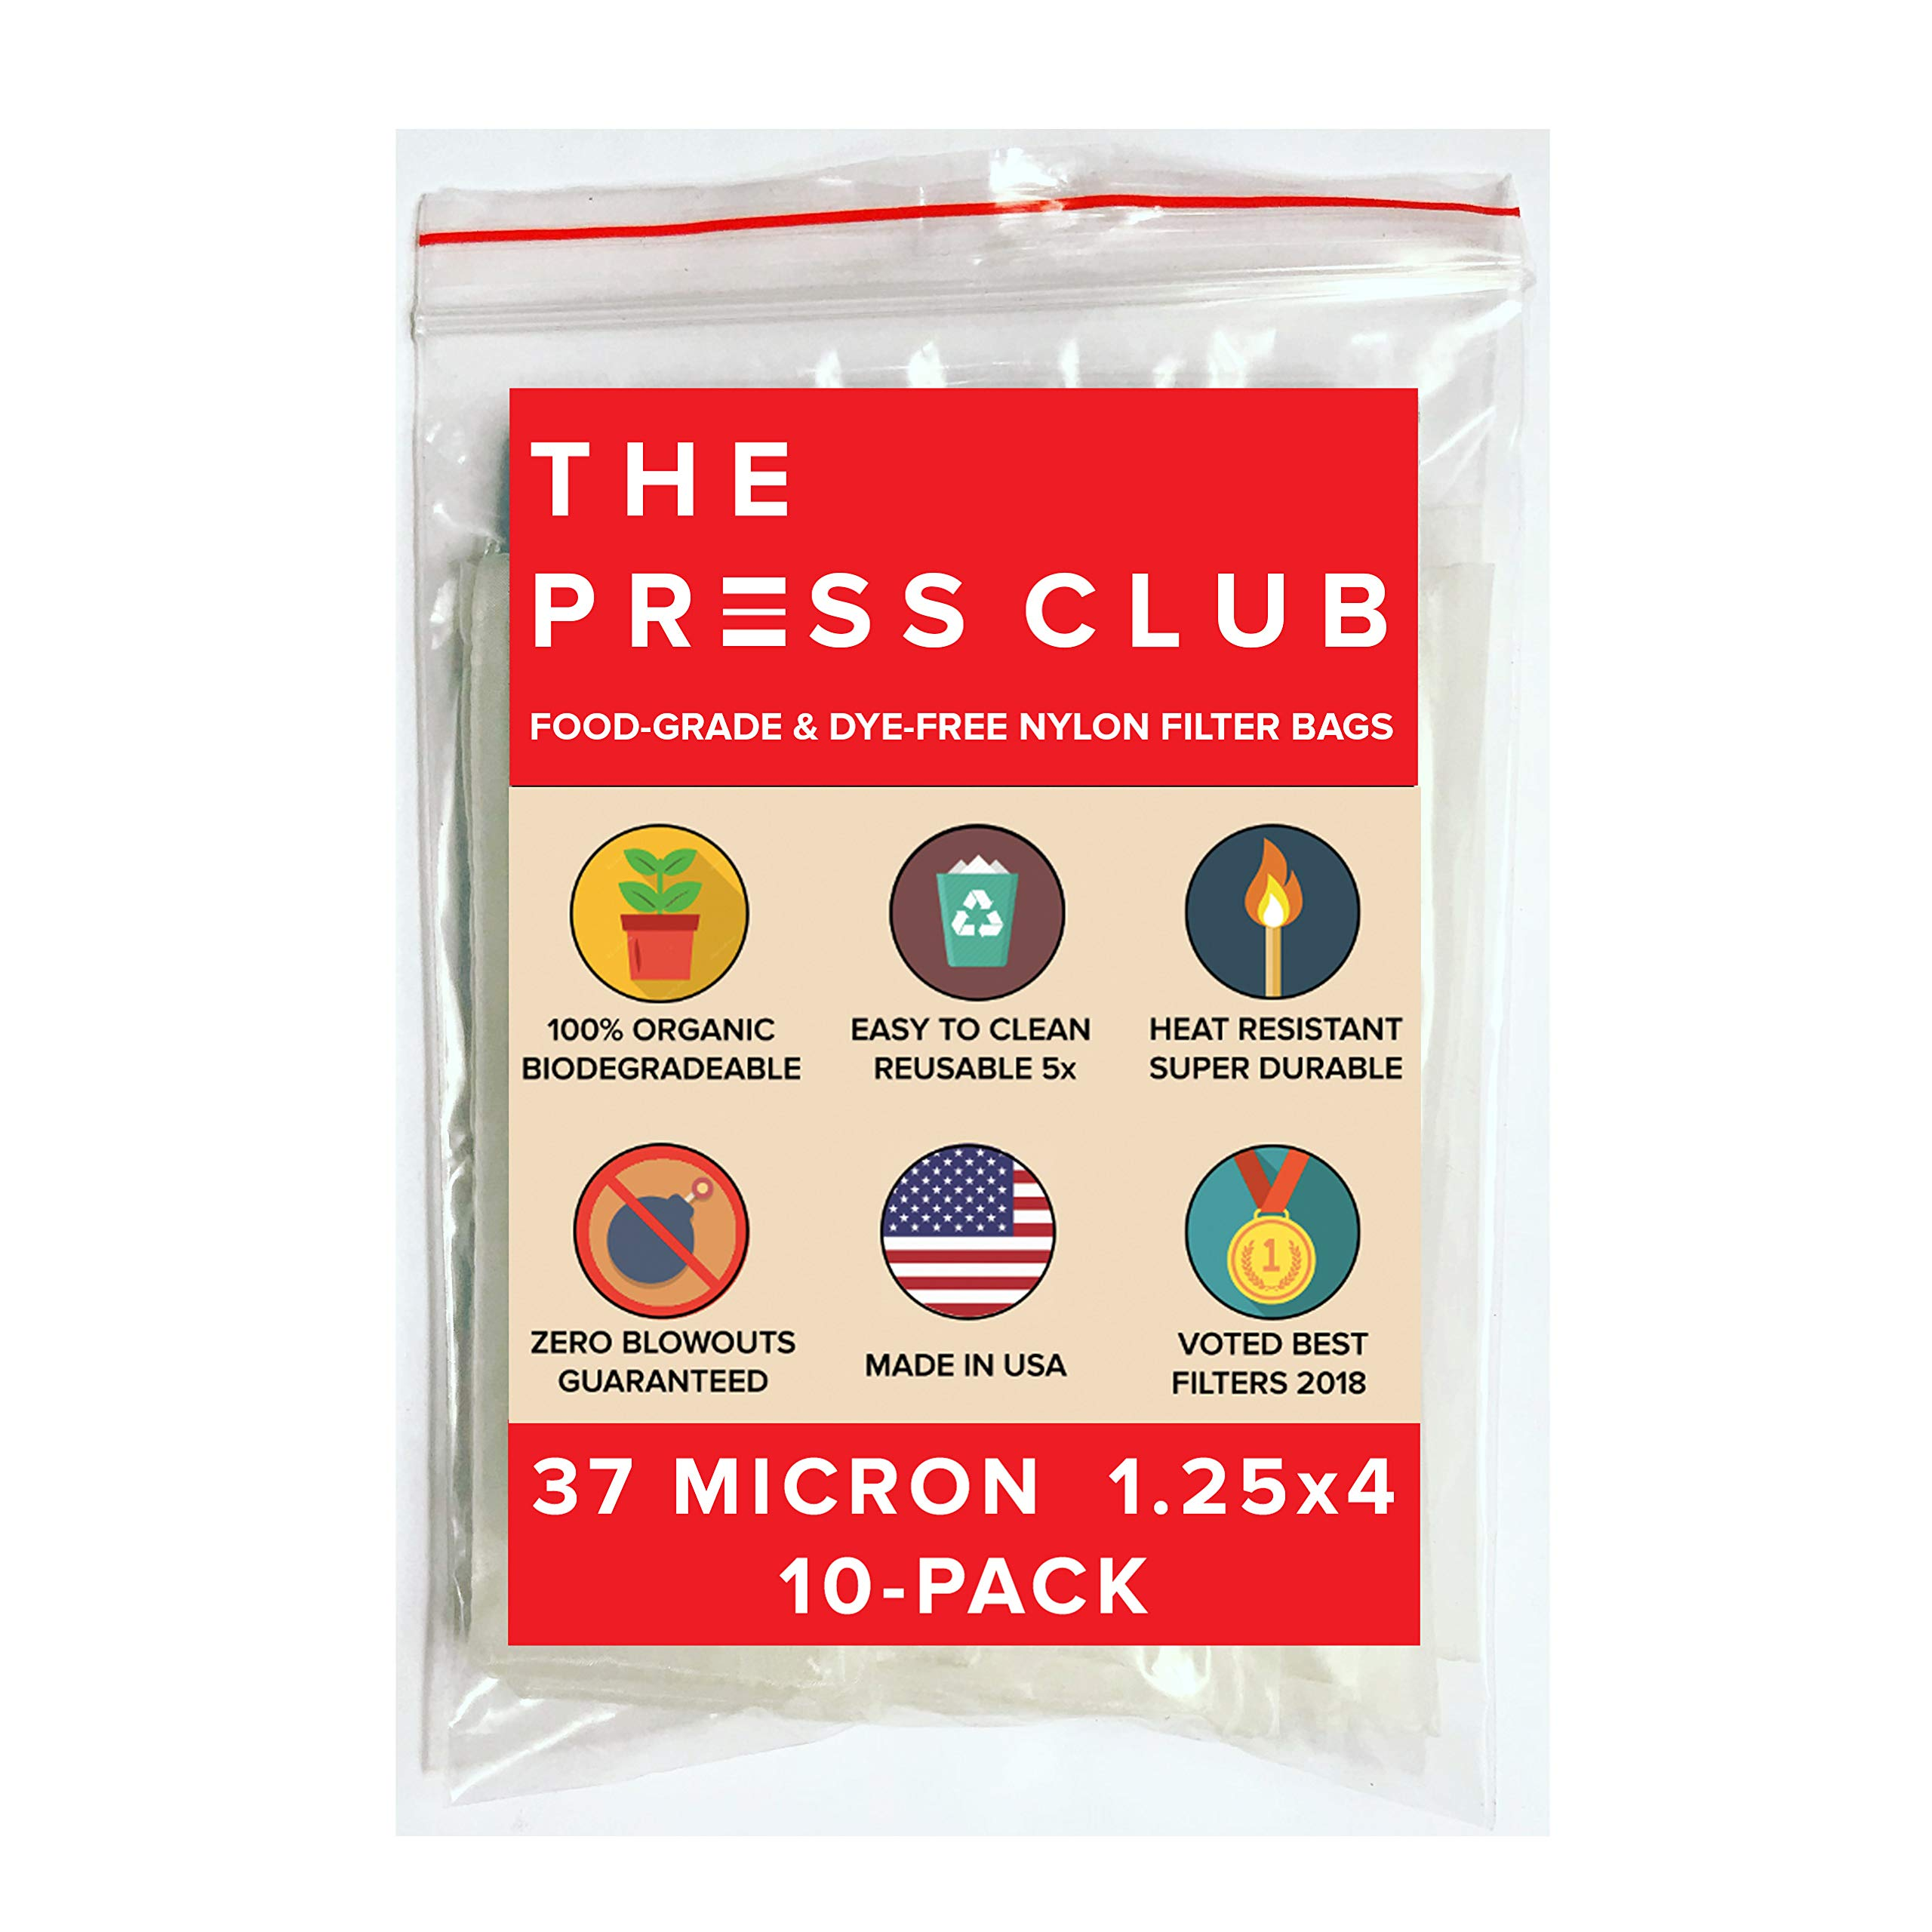 37 Micron | Premium Nylon Tea Filter Press Screen Bags | 1.25'' x 4'' | 10 Pack | Zero Blowout Guarantee | All Micron & Sizes Available